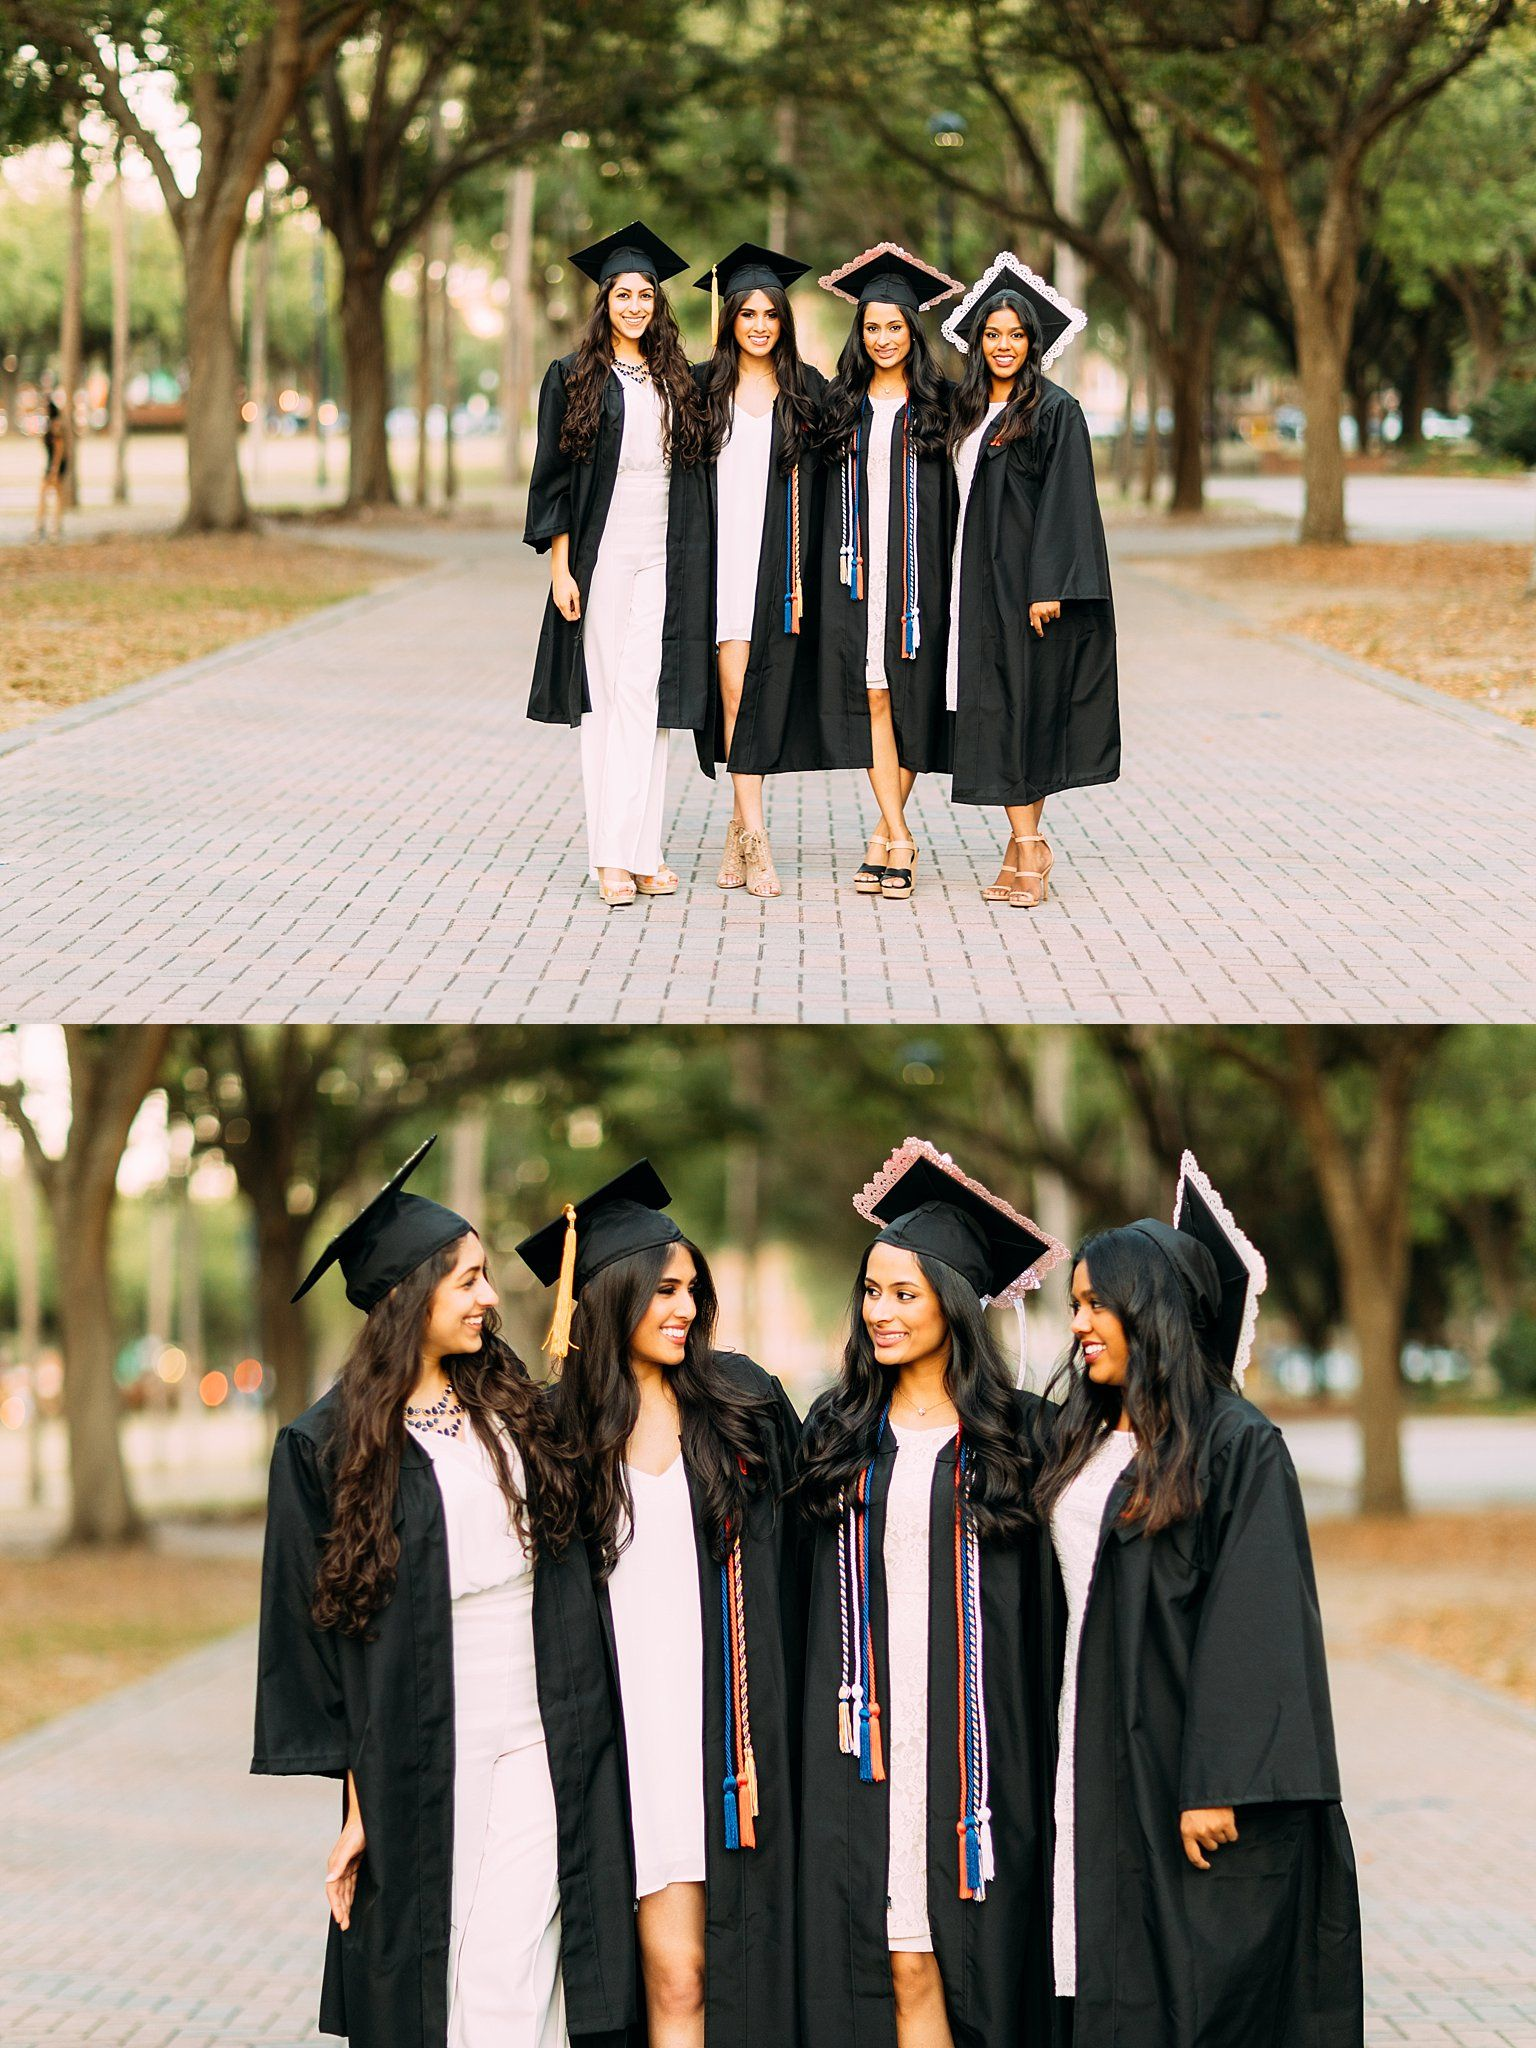 2a91e7fbbe Graduation Photo Ideas